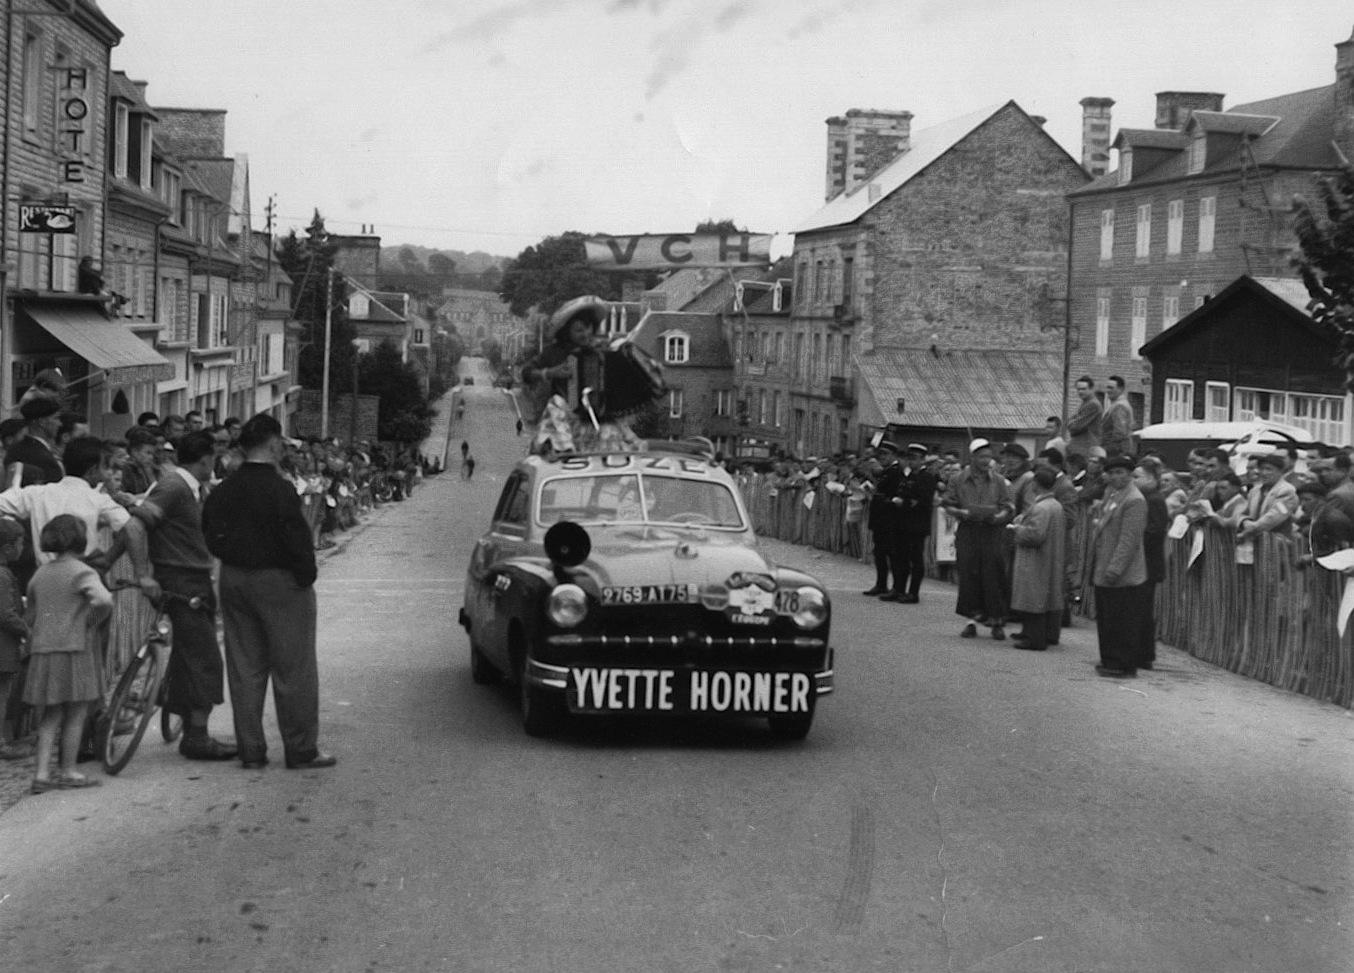 Devinette - Page 17 Yvette-horner_tour-de-france_1954_4